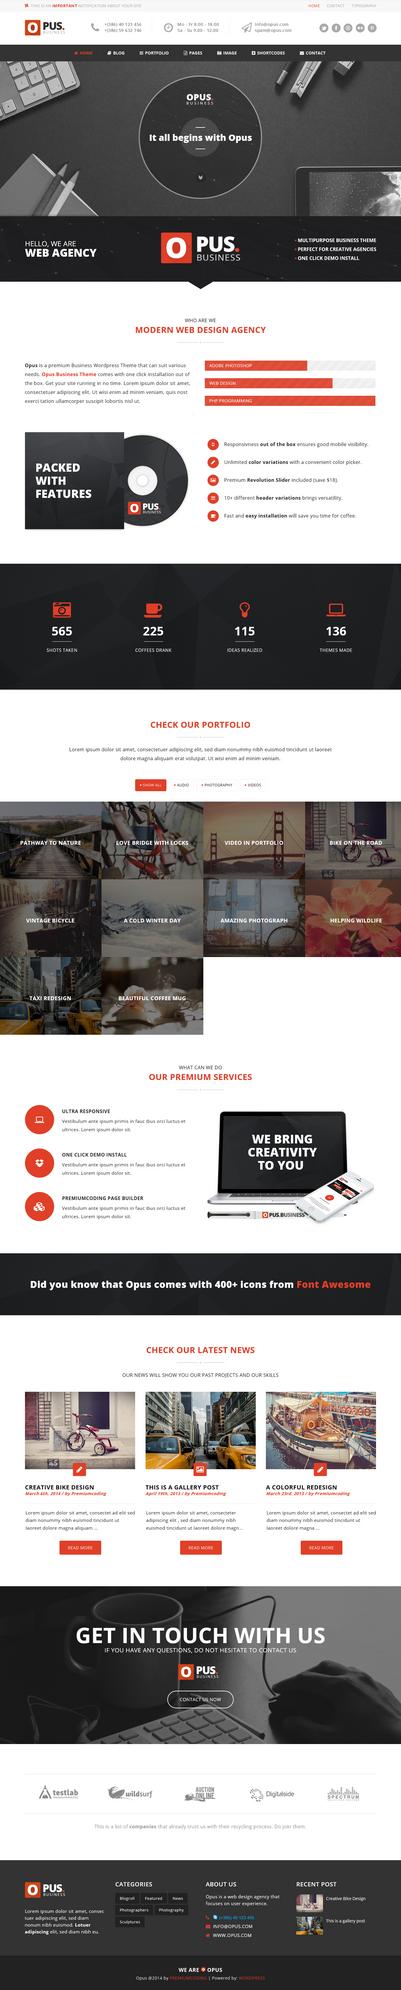 Opus - Multipurpose Business WordPress Theme by webdesigngeek